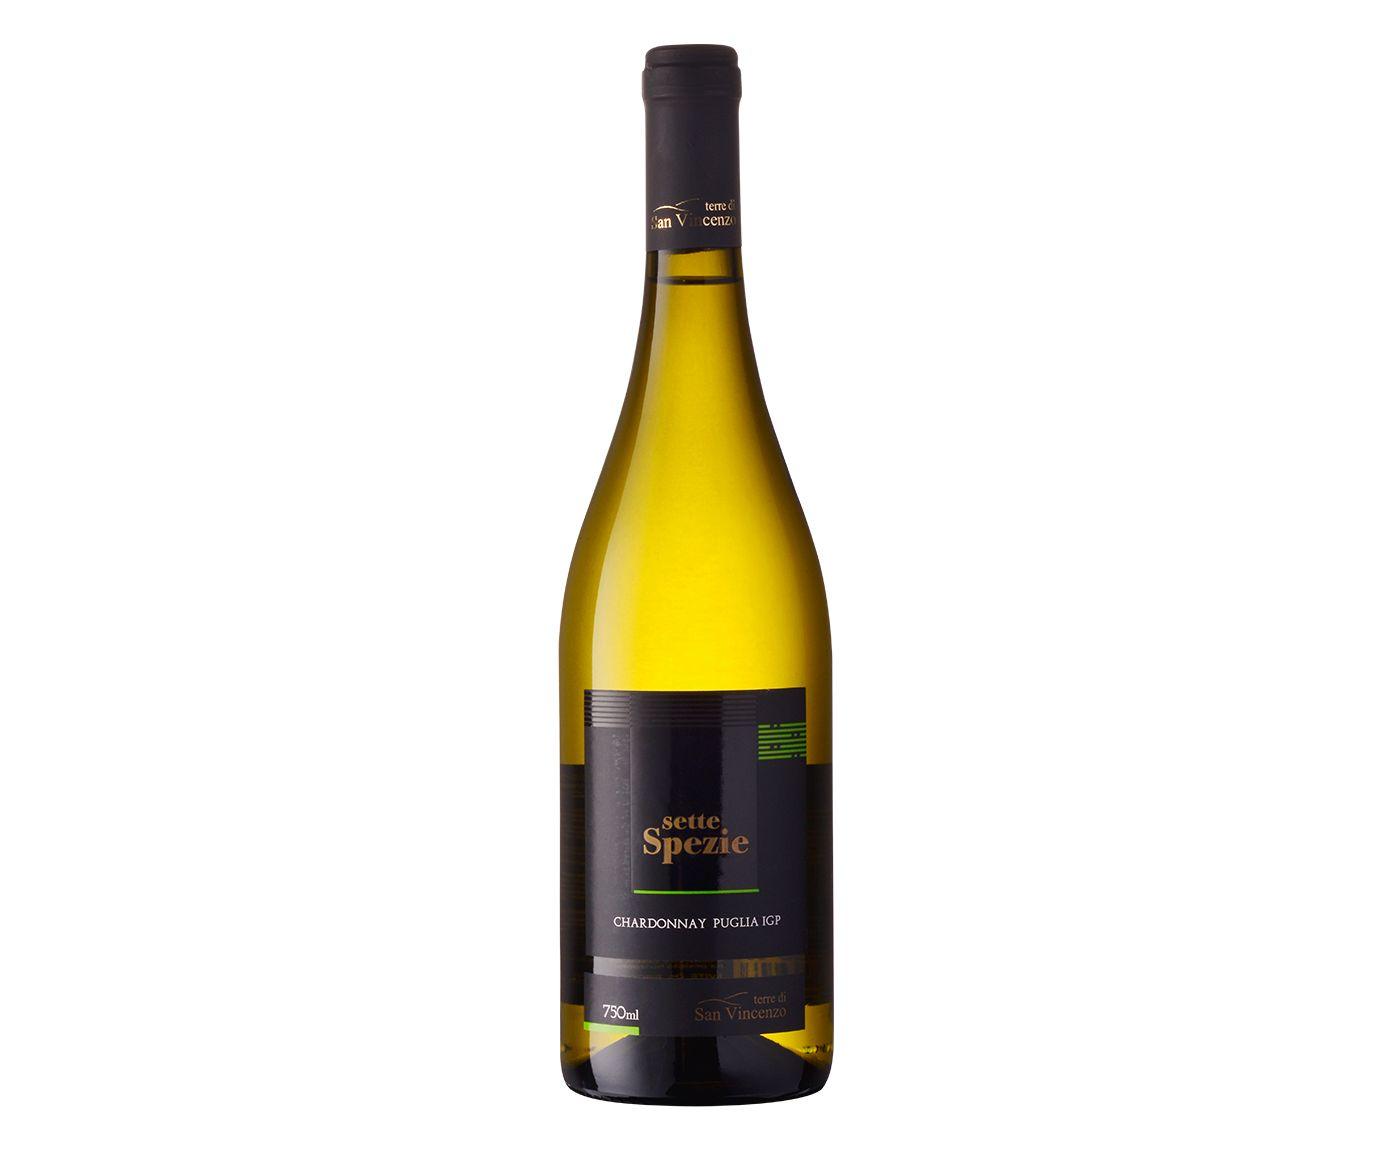 Vinho Branco It Sette Speziechard Puglia Igp - 750ml | Westwing.com.br